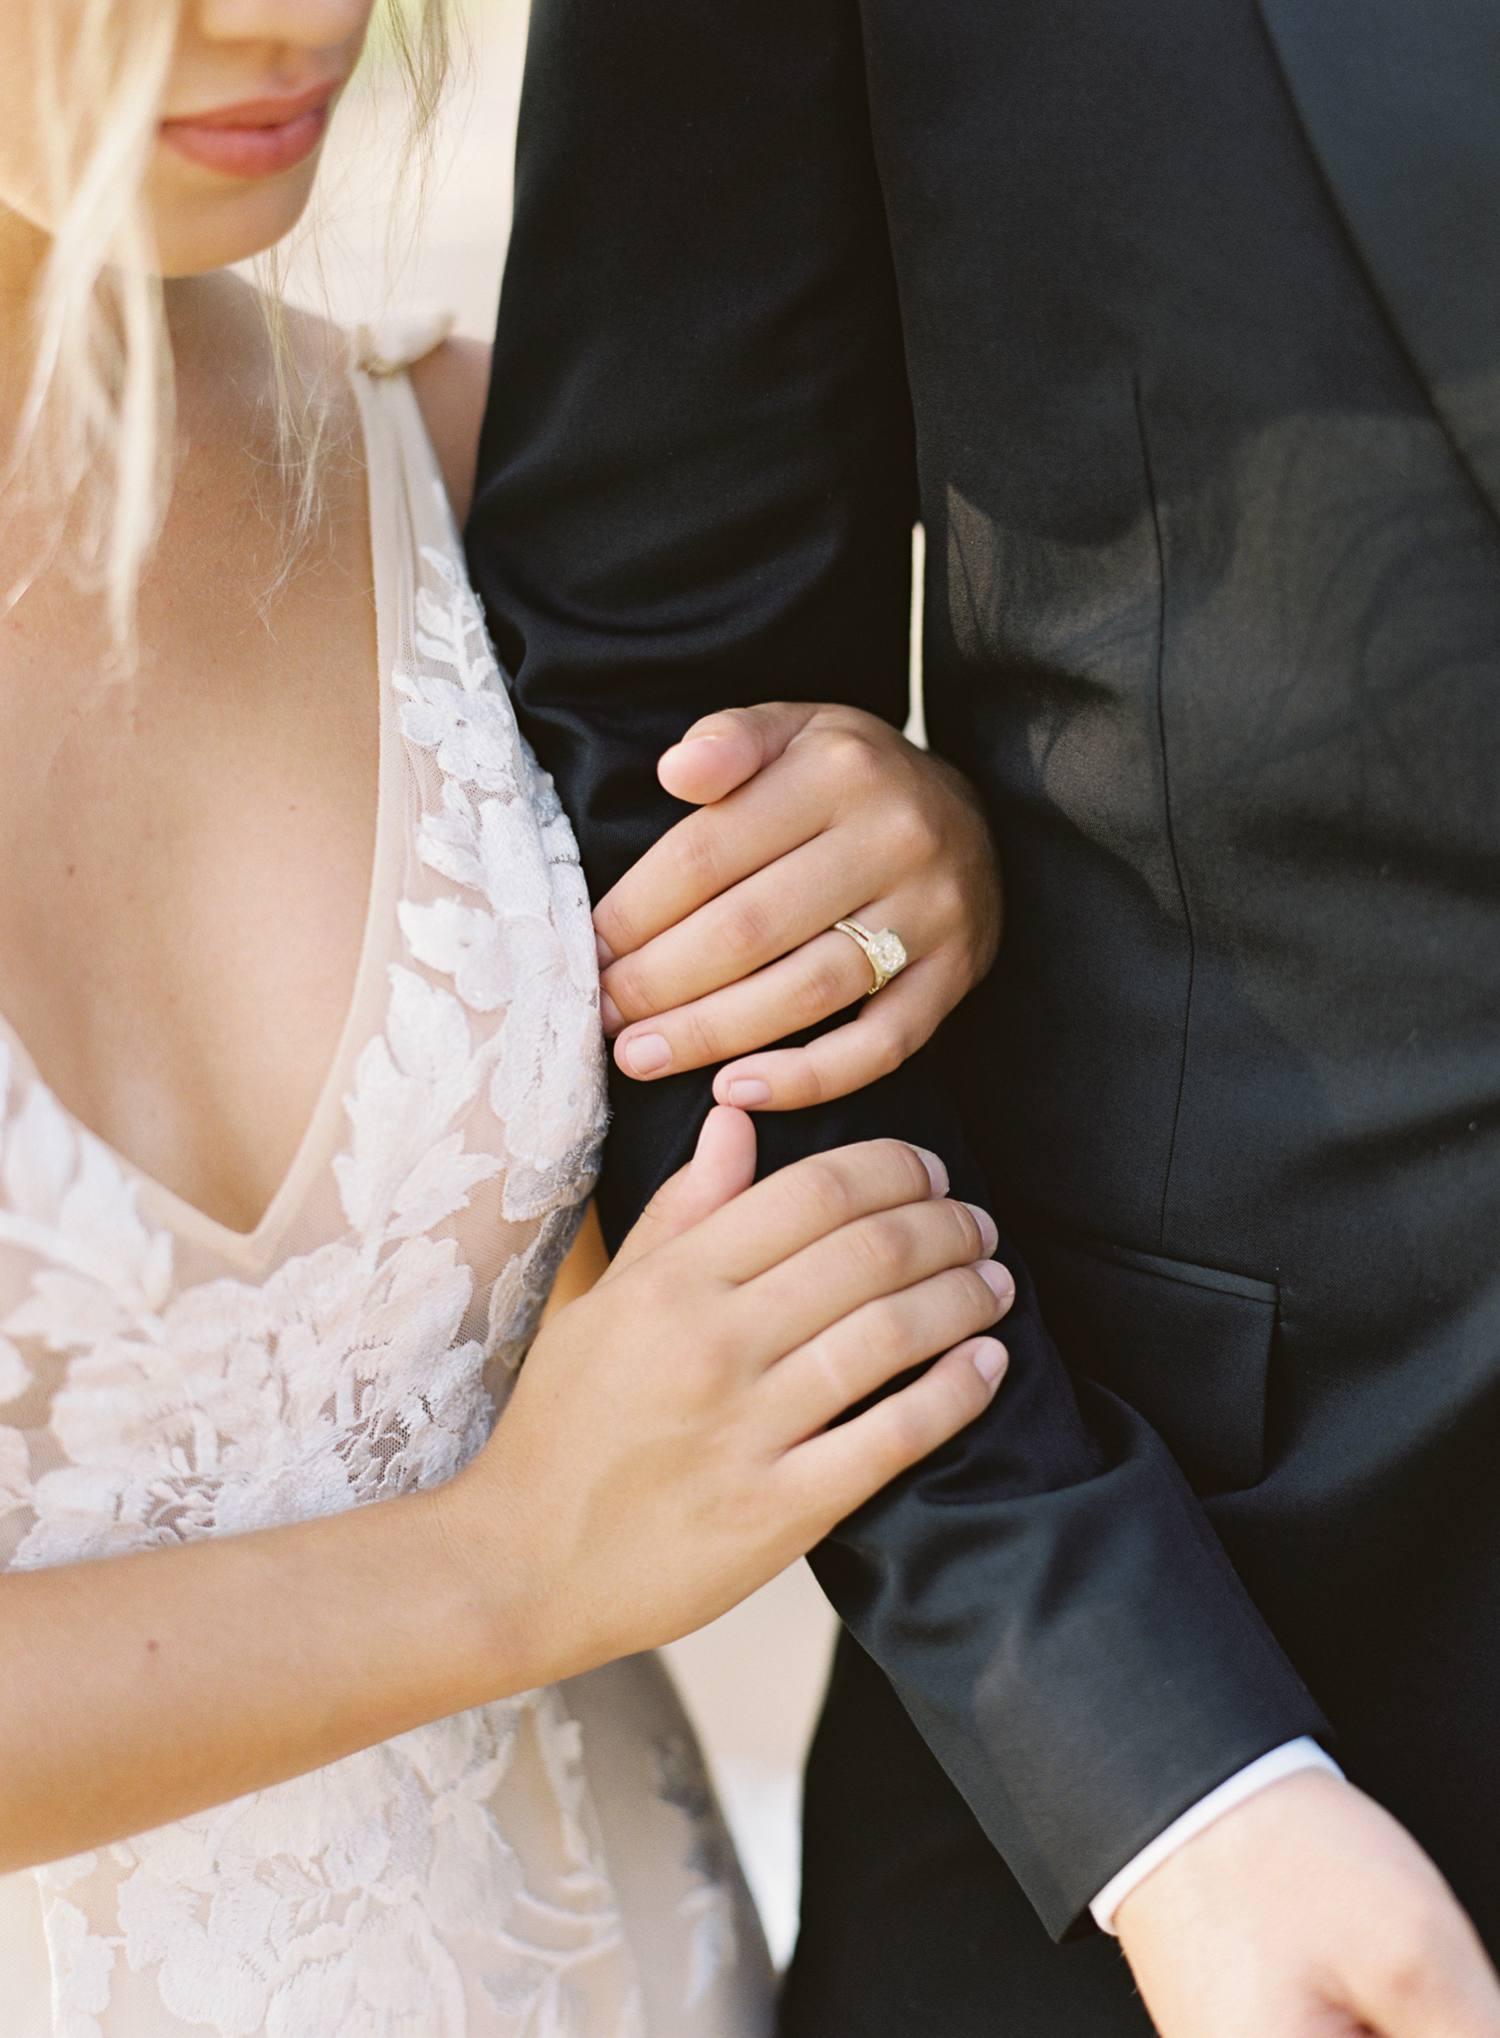 boonehallplantation_wedding_6.jpg